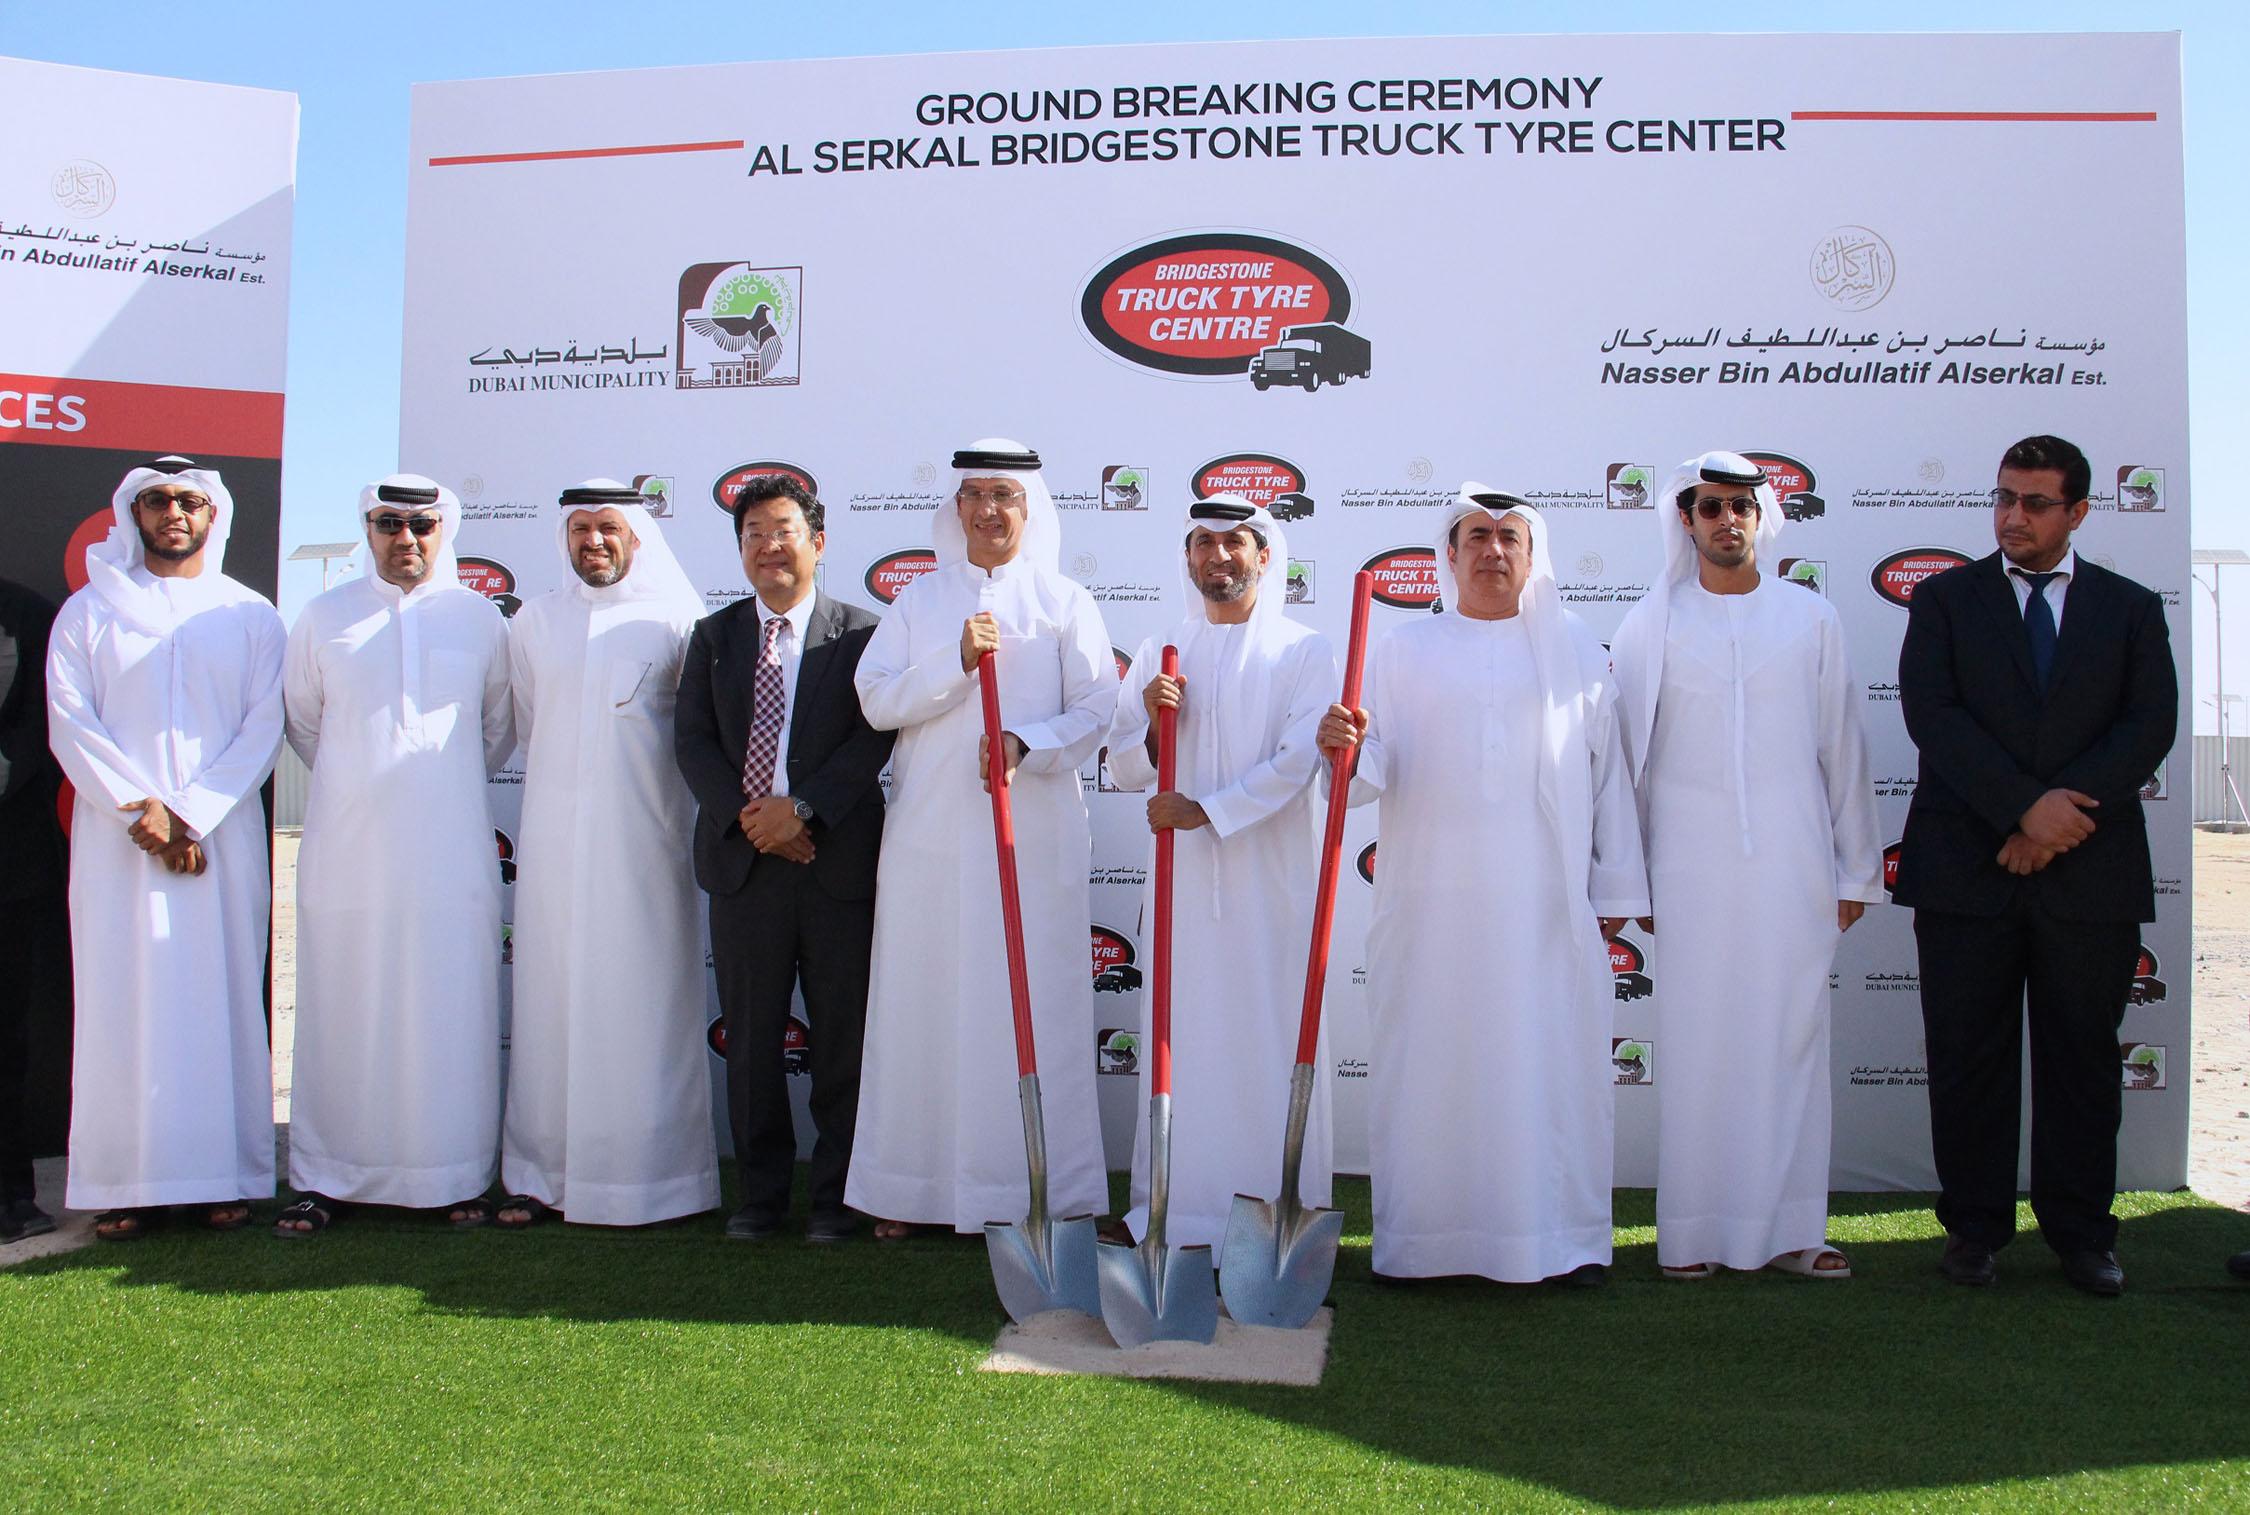 Nasser Bin Abdullatif Alserkal Est. and Dubai Municipality Breaks Ground for AED 10 Million Truck Tyre Centre Project